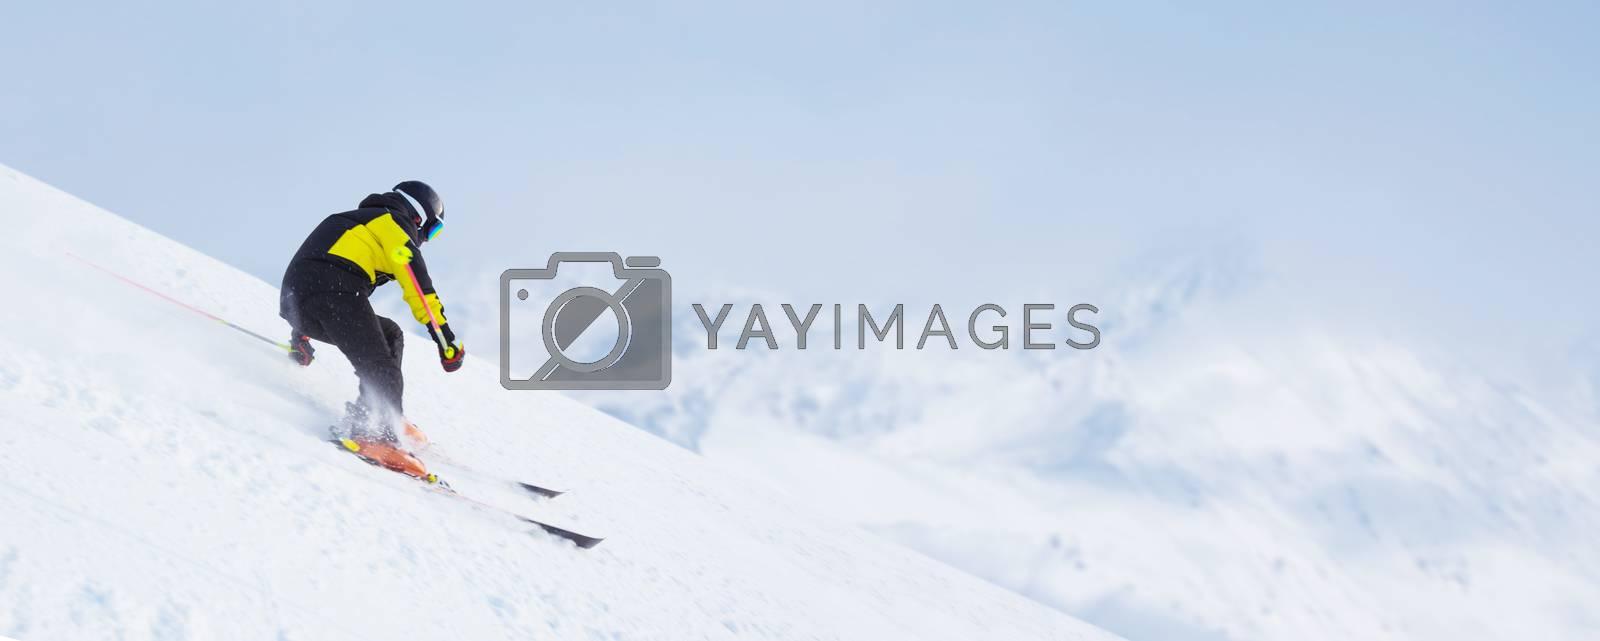 Skier man skiing downhill in high mountains piste, Solden, Tyrol, Austria